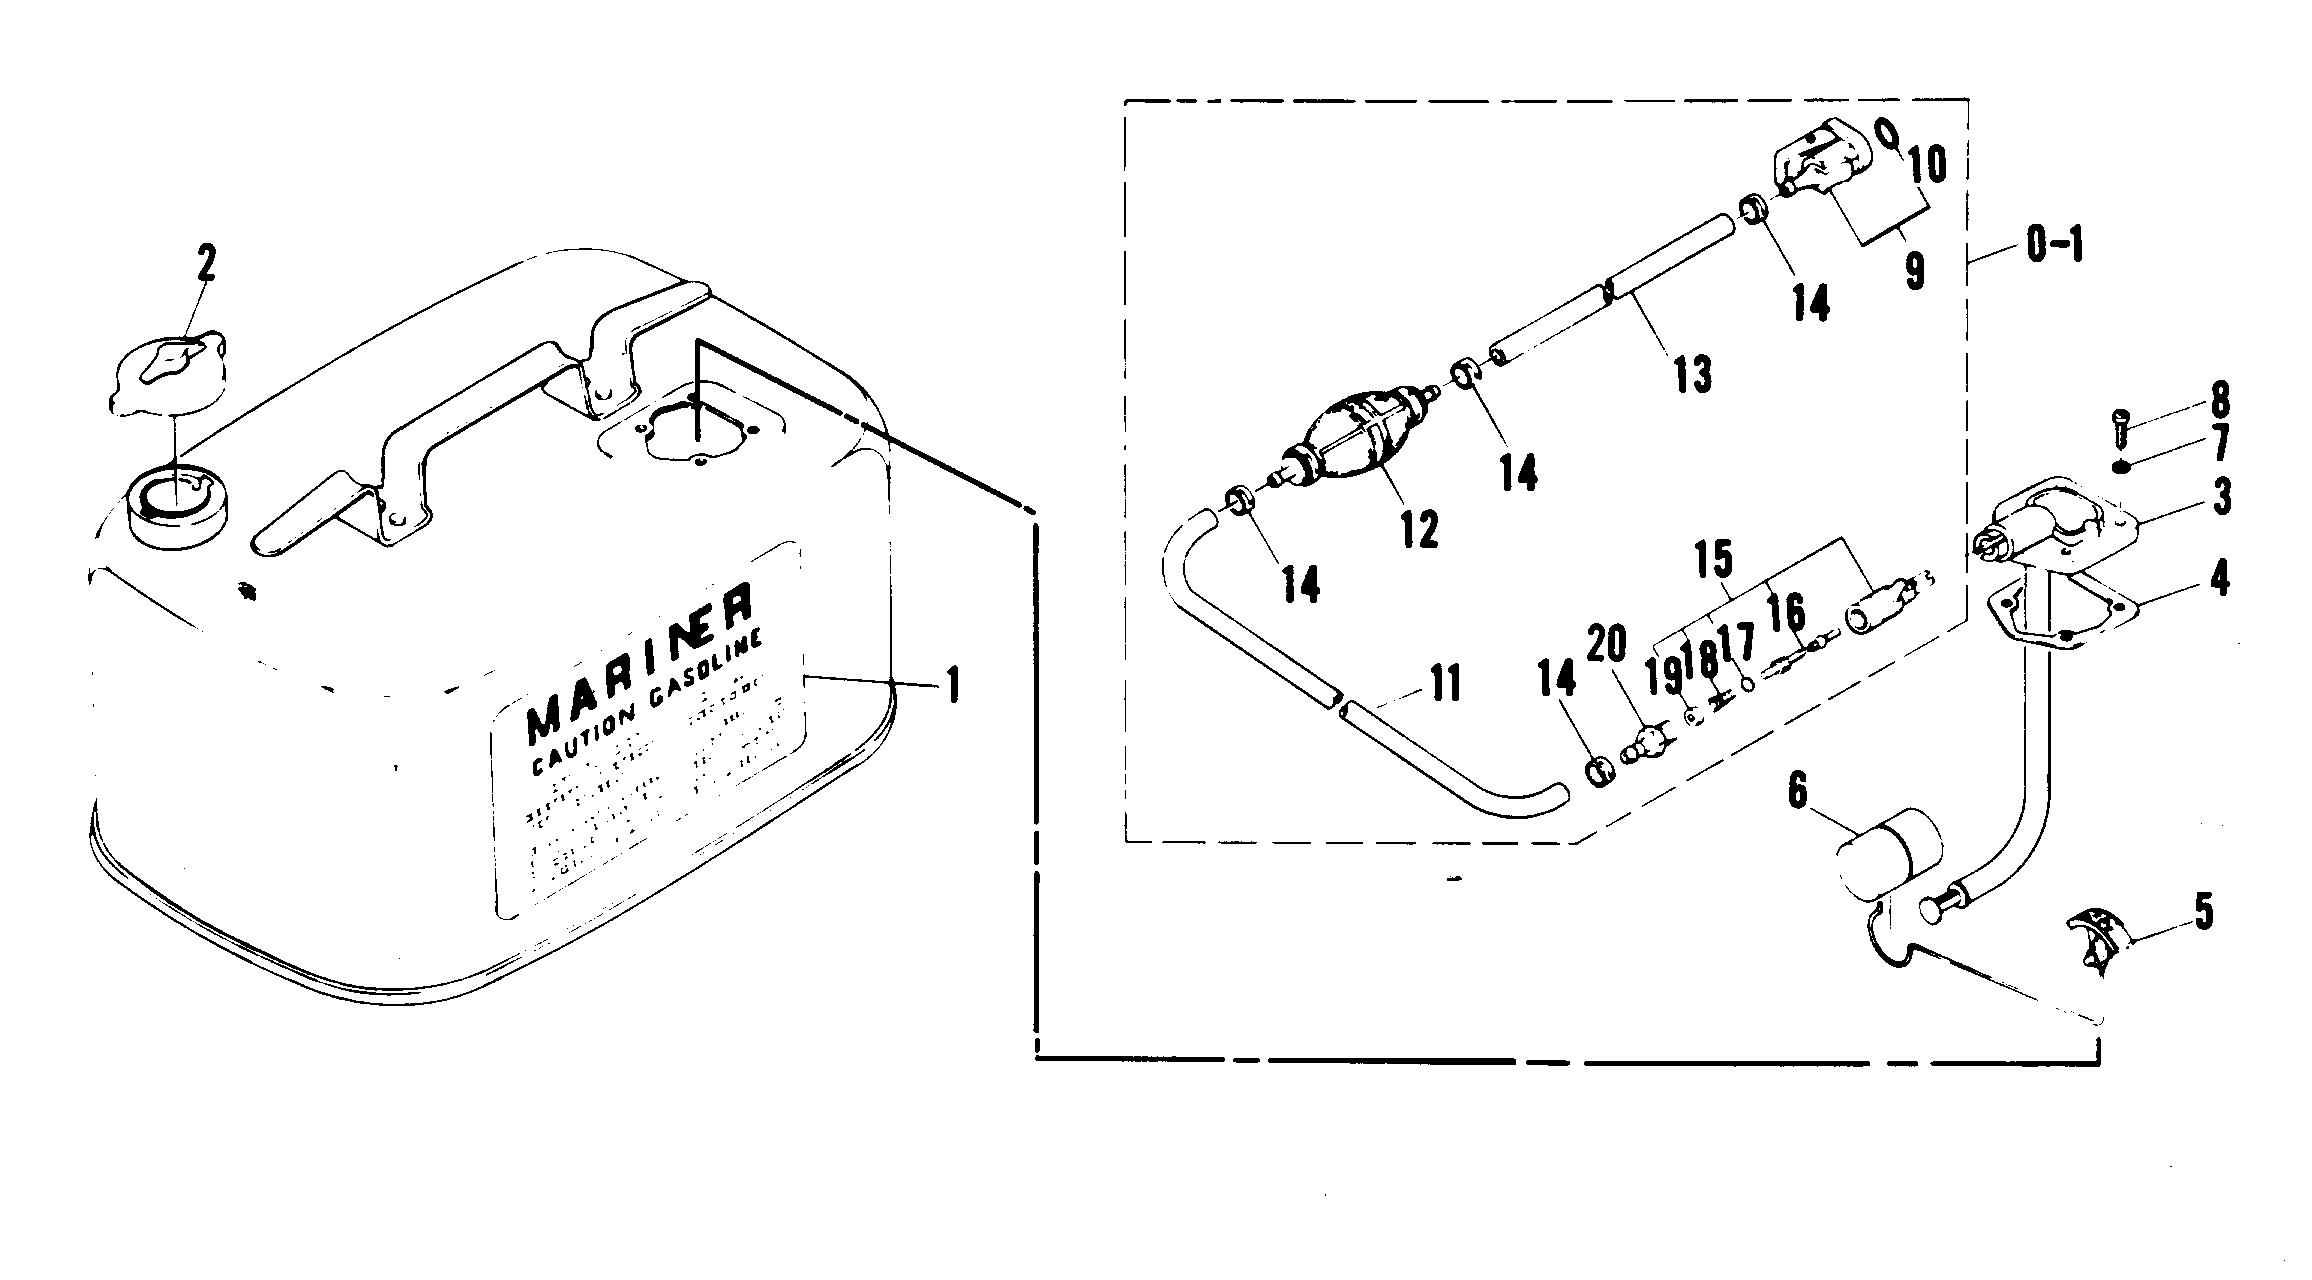 Каталог запчастей MARINER W30 (W/MARATHON) 689-B300101 AND